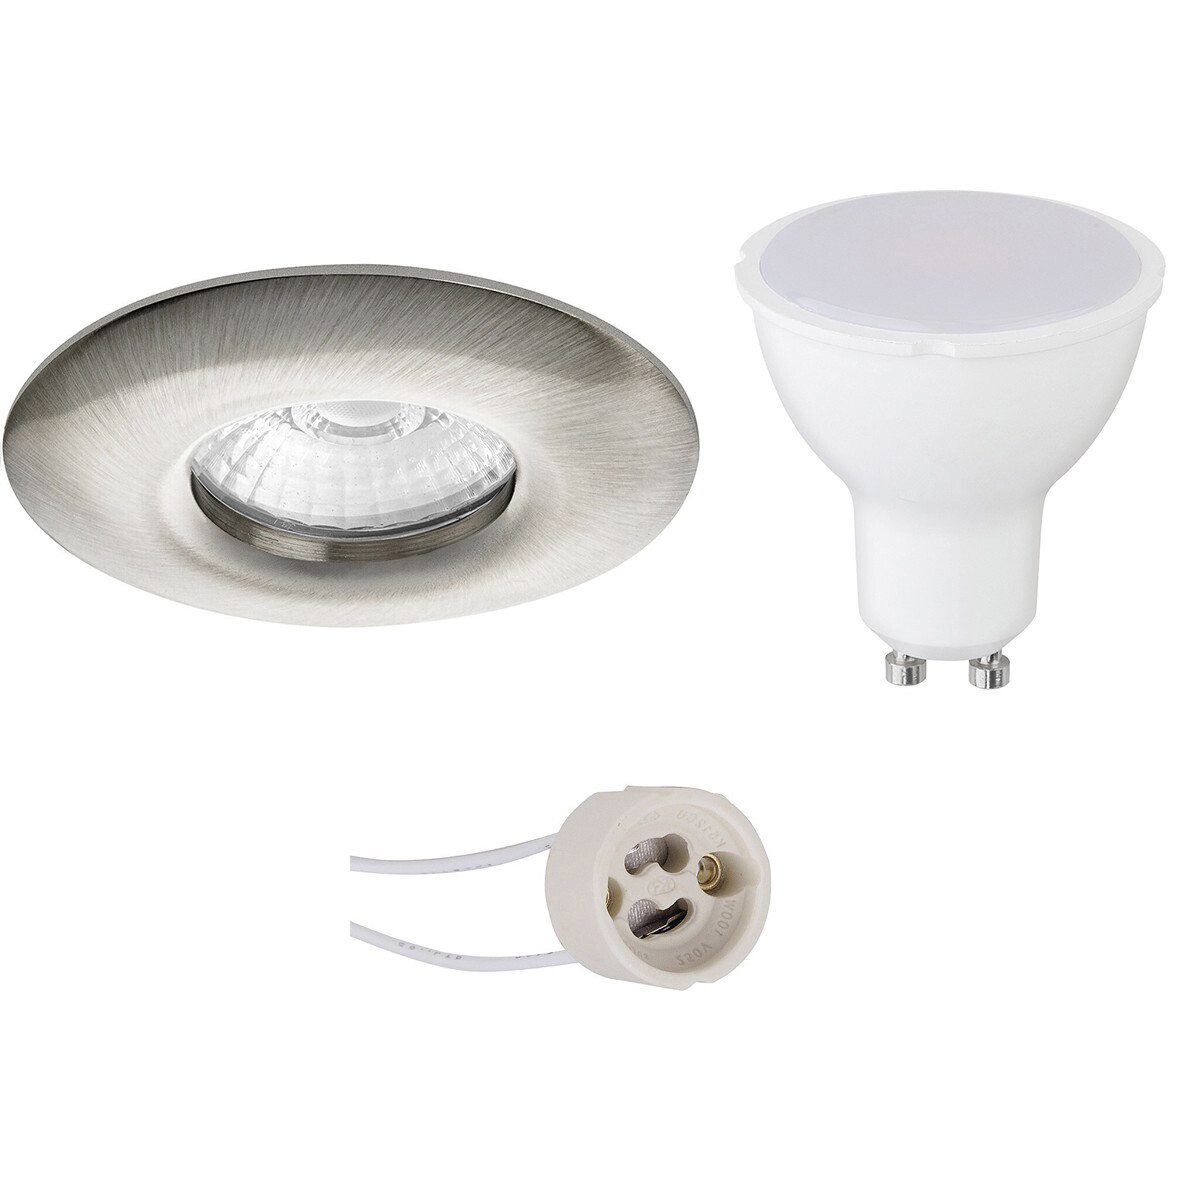 LED Spot Set - Pragmi Luno Pro - Waterdicht IP65 - GU10 Fitting - Dimbaar - Inbouw Rond - Mat Nikkel